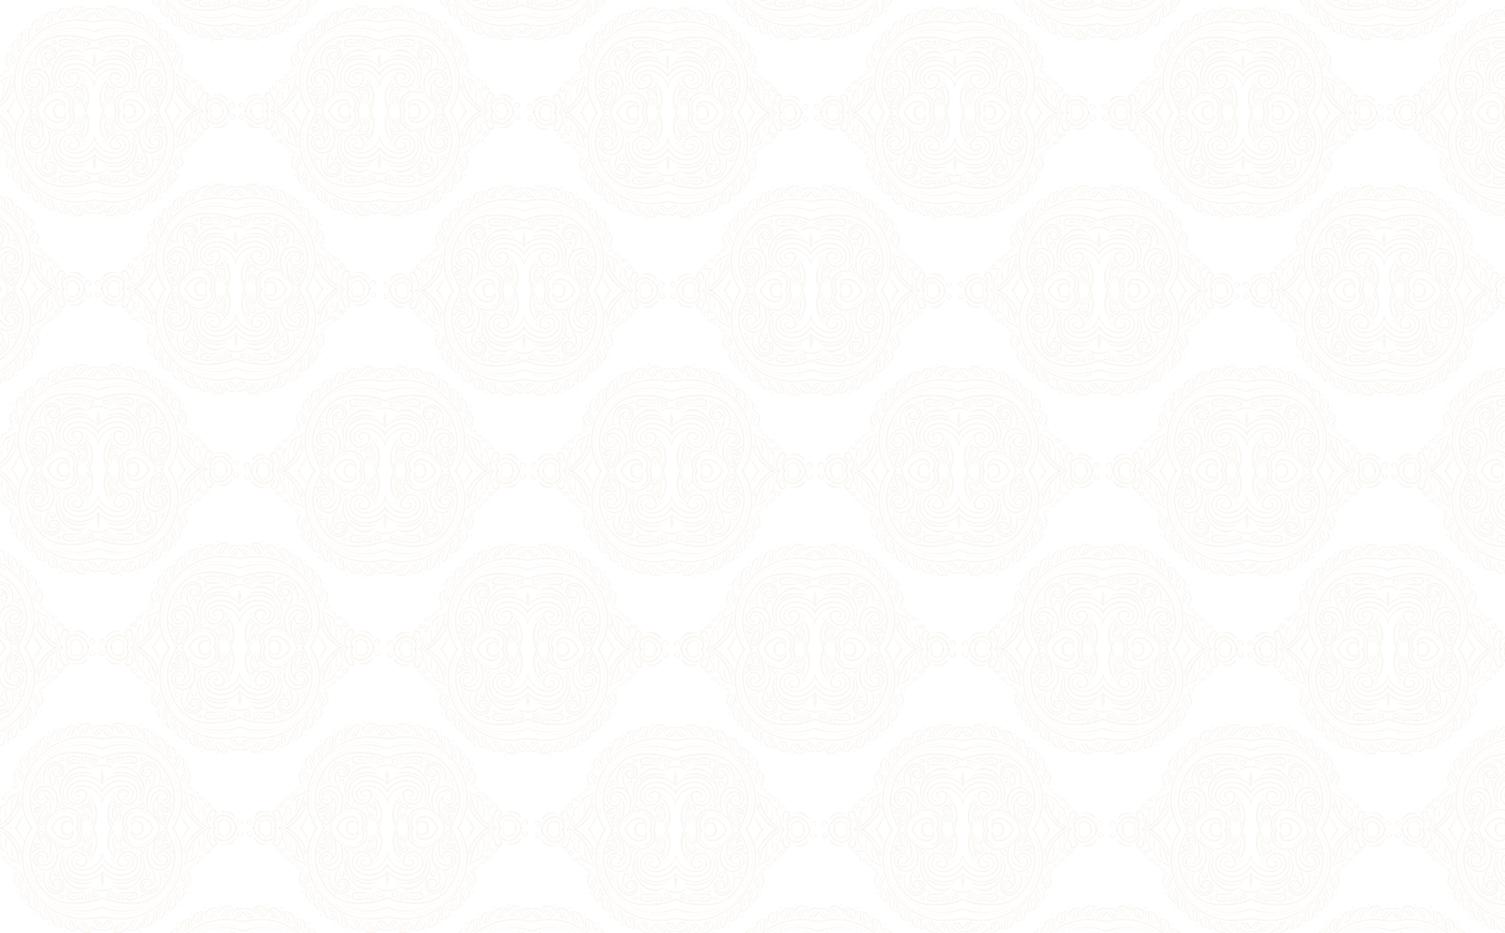 pozadi tantra savitryi svetle (1) (1).png